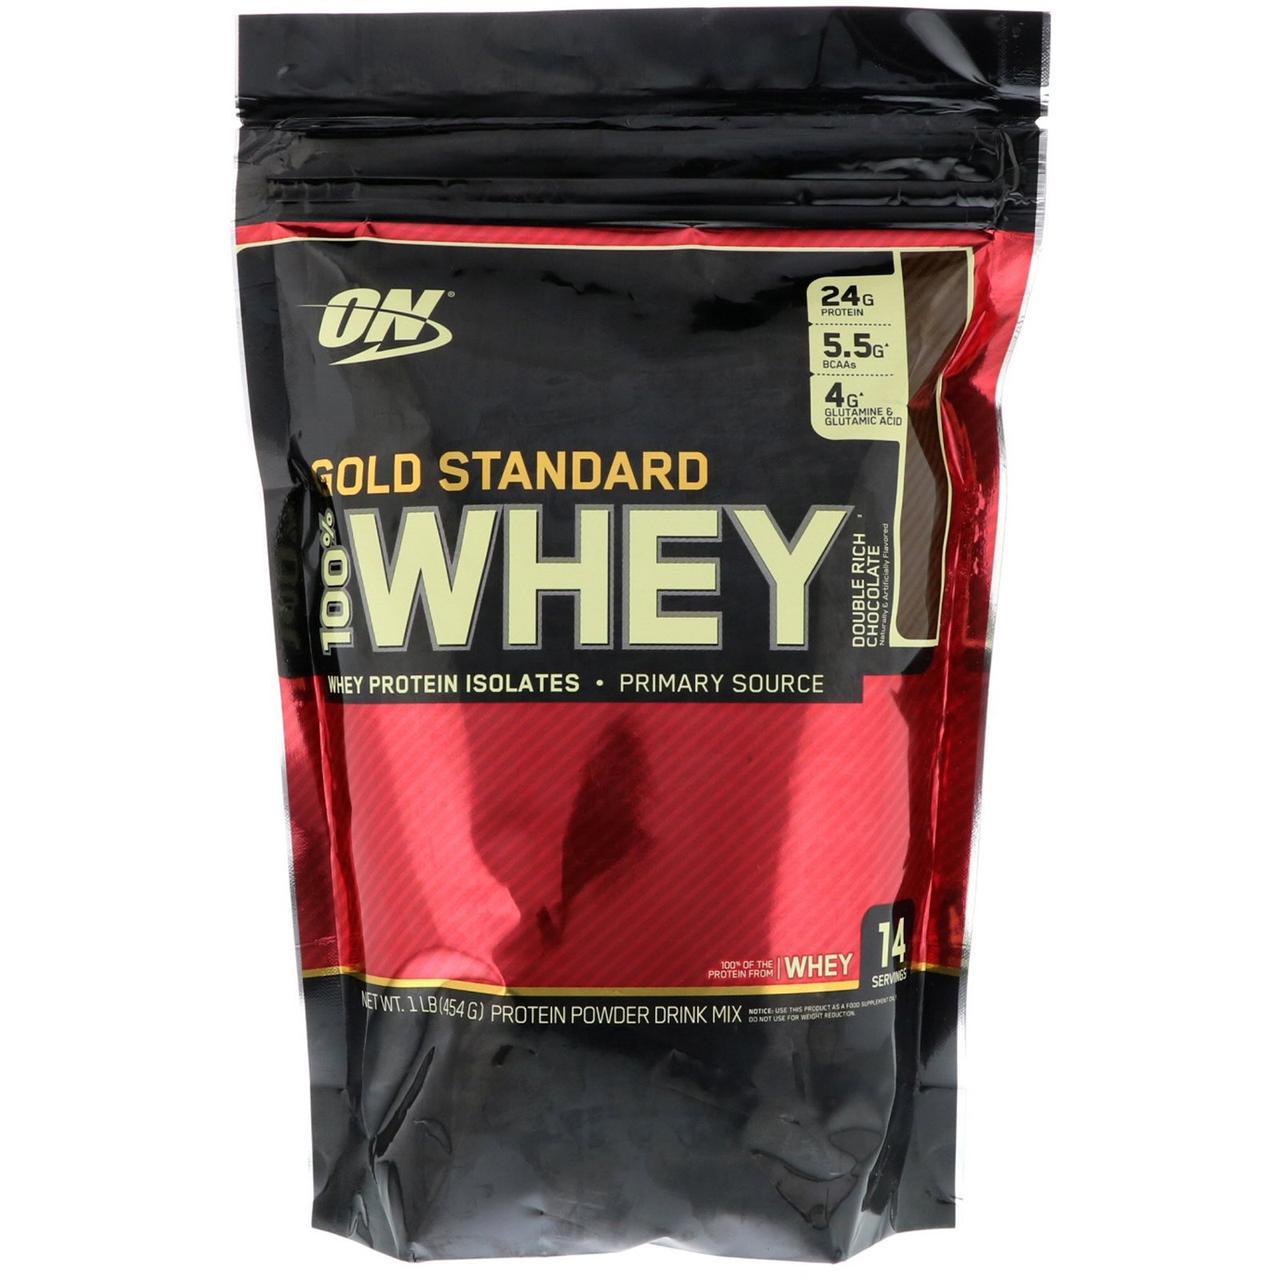 Сывороточный протеин (Gold Standard 100% Whey), шоколад, Optimum Nutrition, 454 г